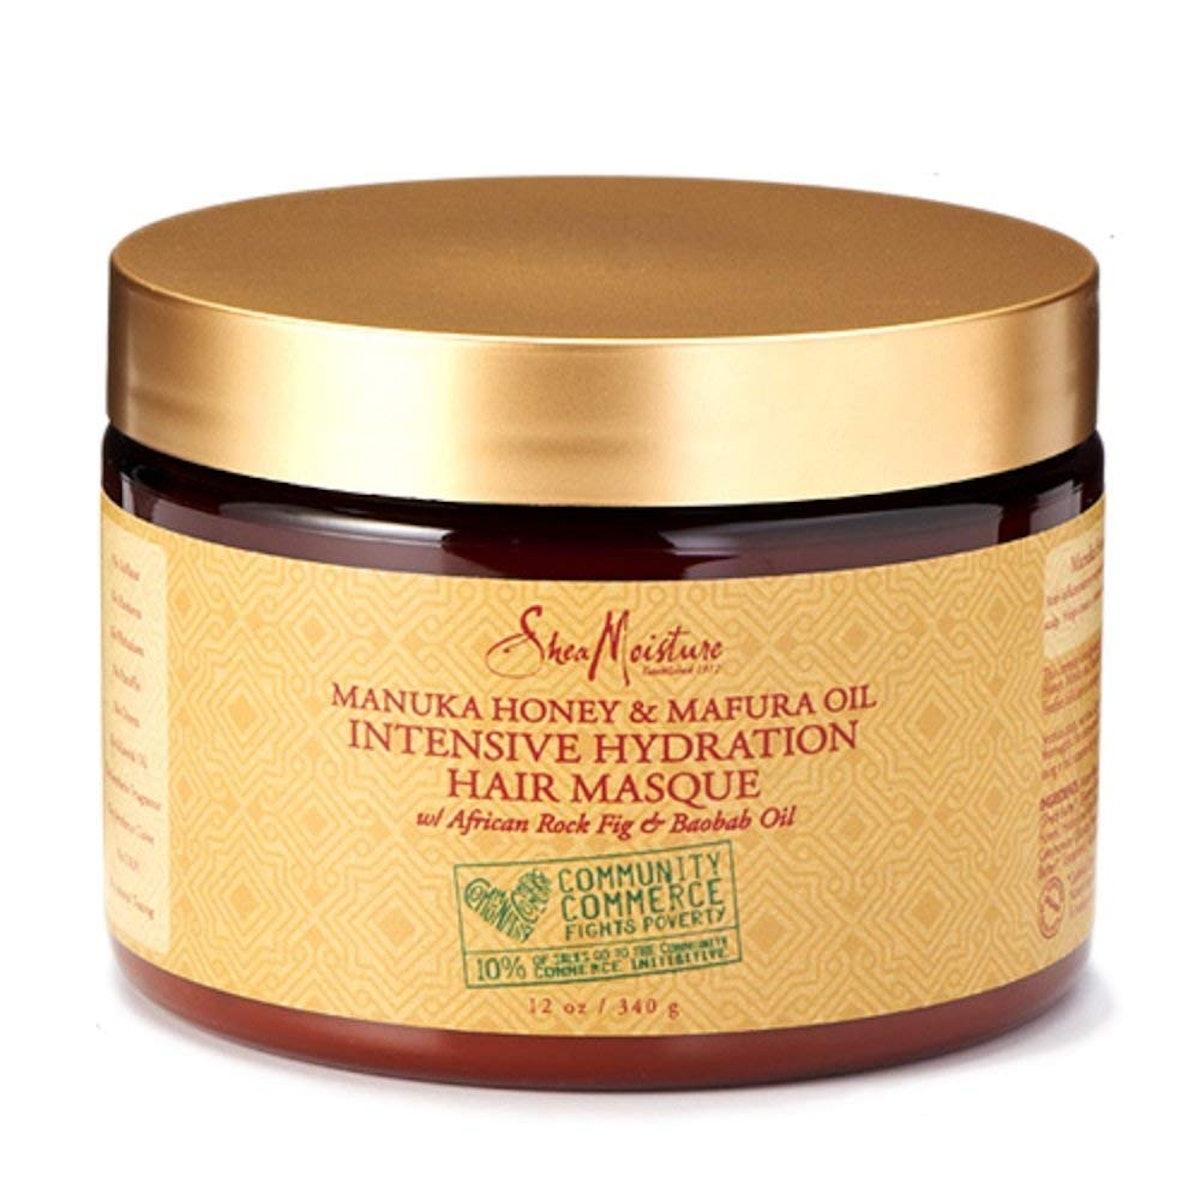 Shea Moisture Manuka Honey & Marfura Oil Intensive Hydration Hair Masque